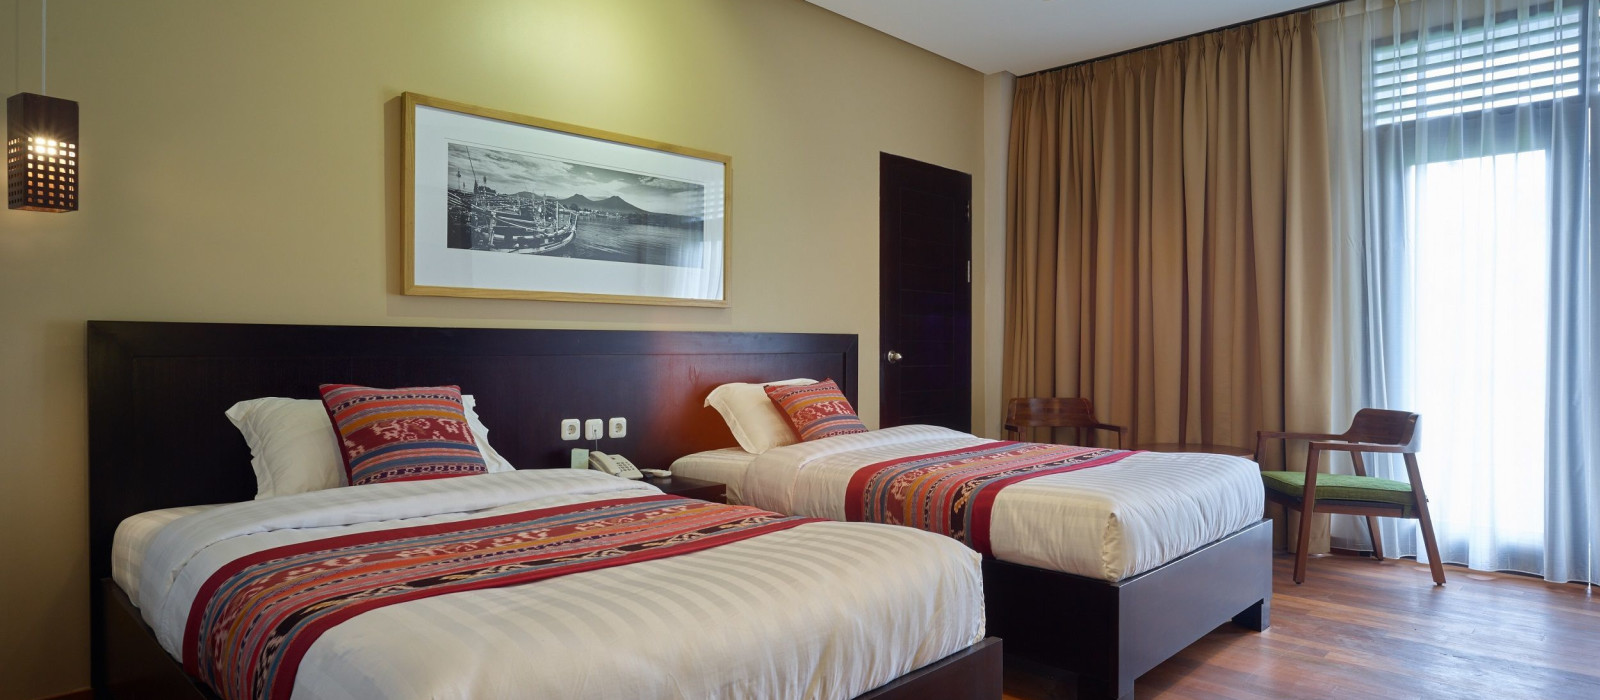 Hotel Jiwa Jawa Resort Ijen Indonesien